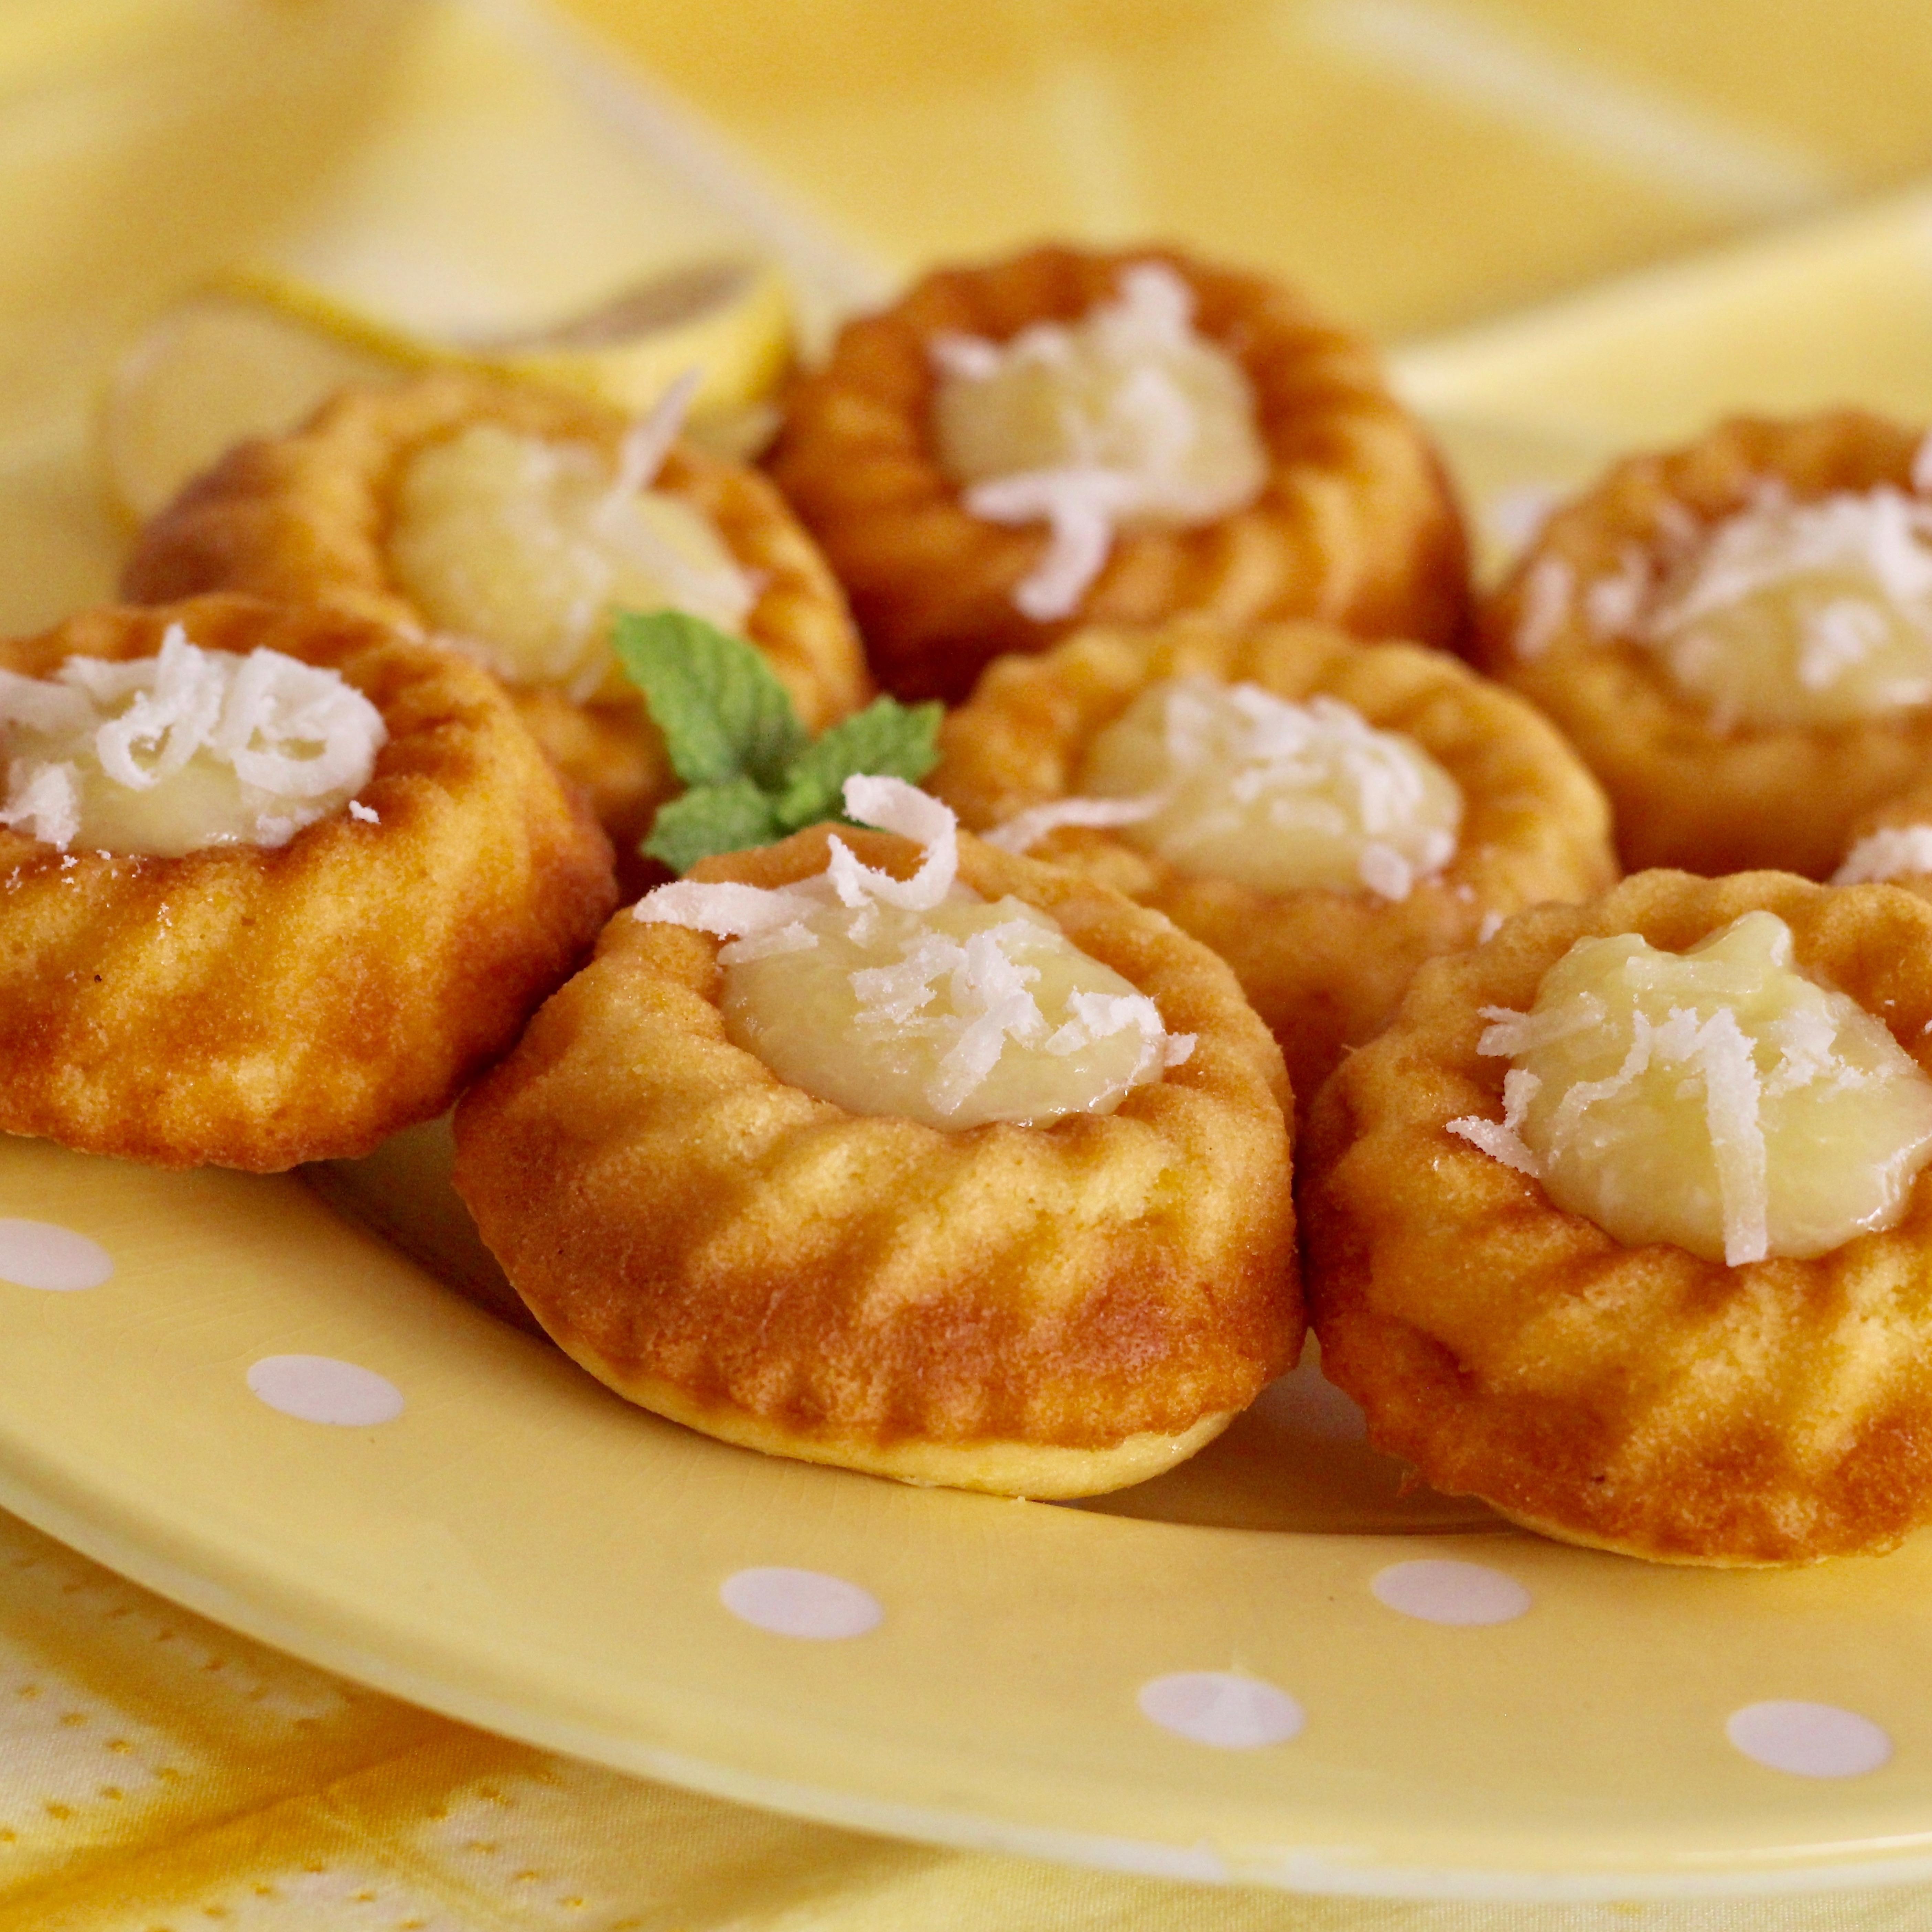 Pina Colada Cake Palmas Del Mar-Style camille